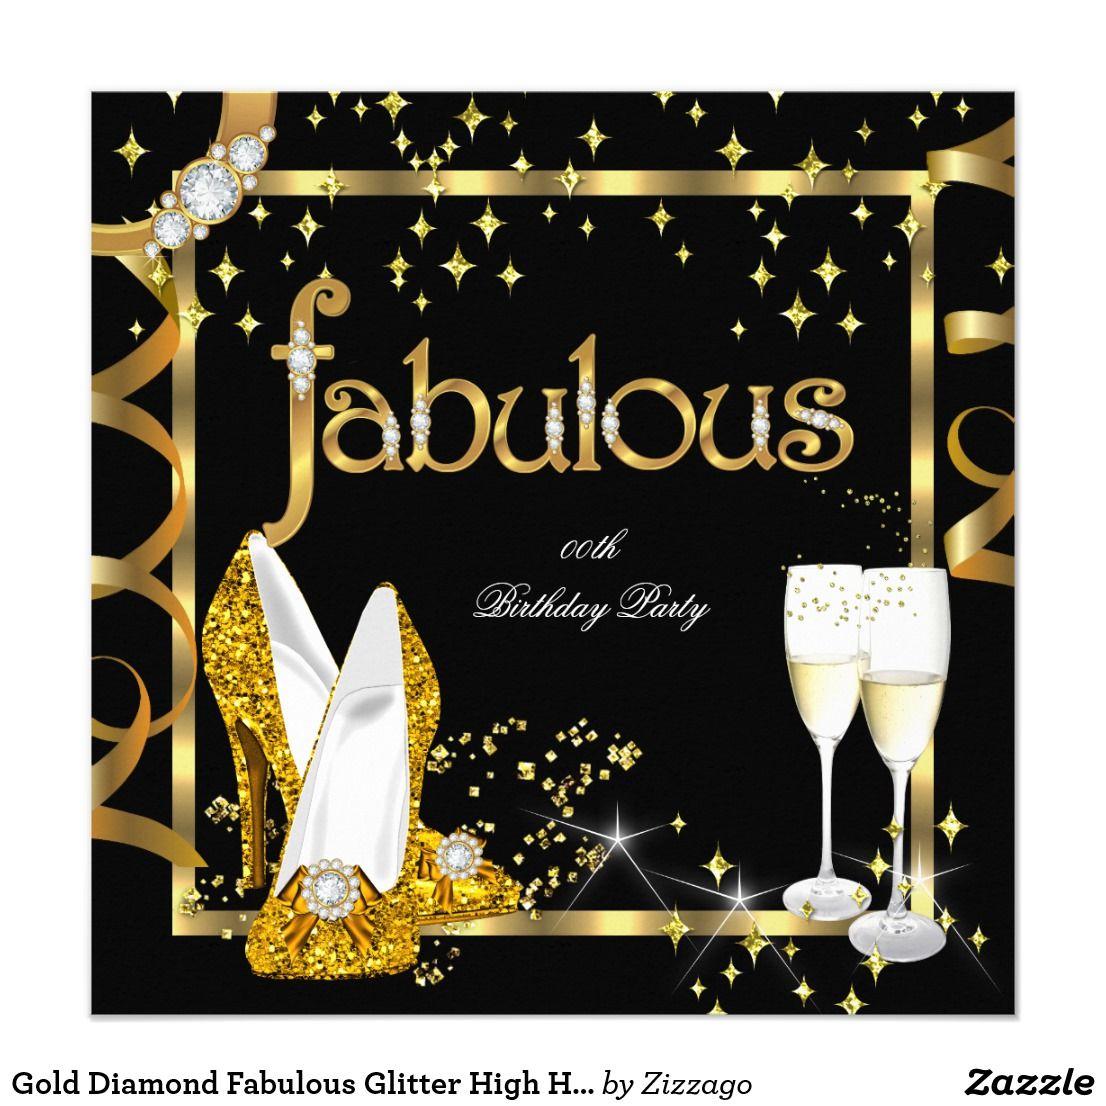 Gold Diamond Fabulous Glitter High Heels Party Invitation ...